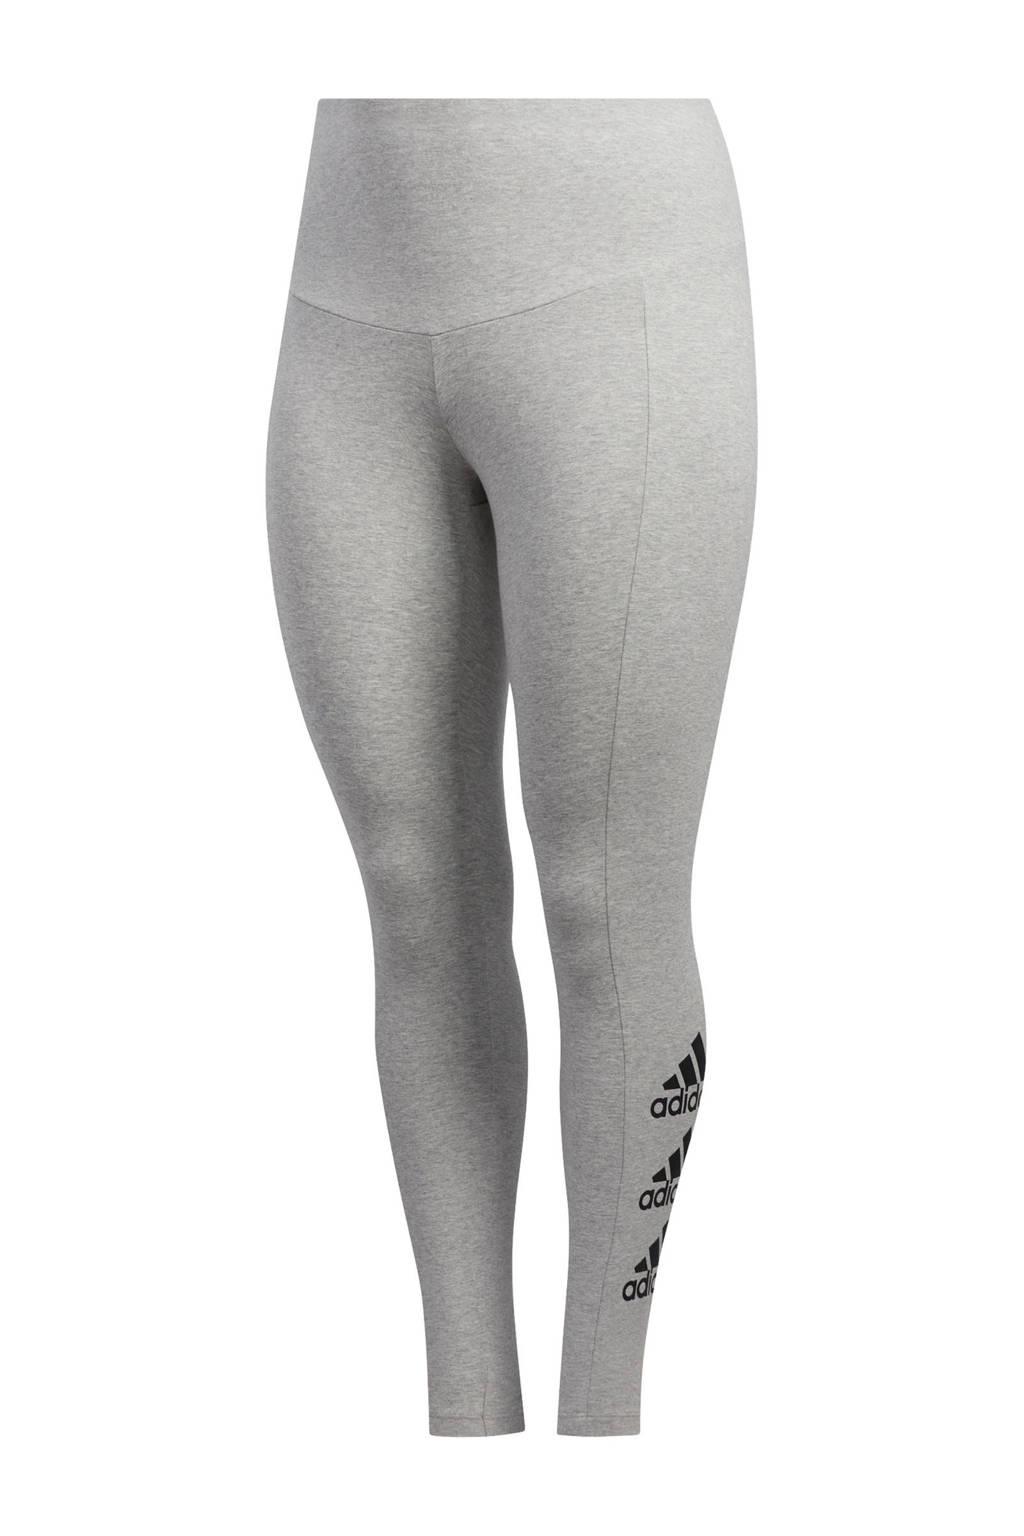 adidas Performance Plus Size sportbroek grijs, Grijs